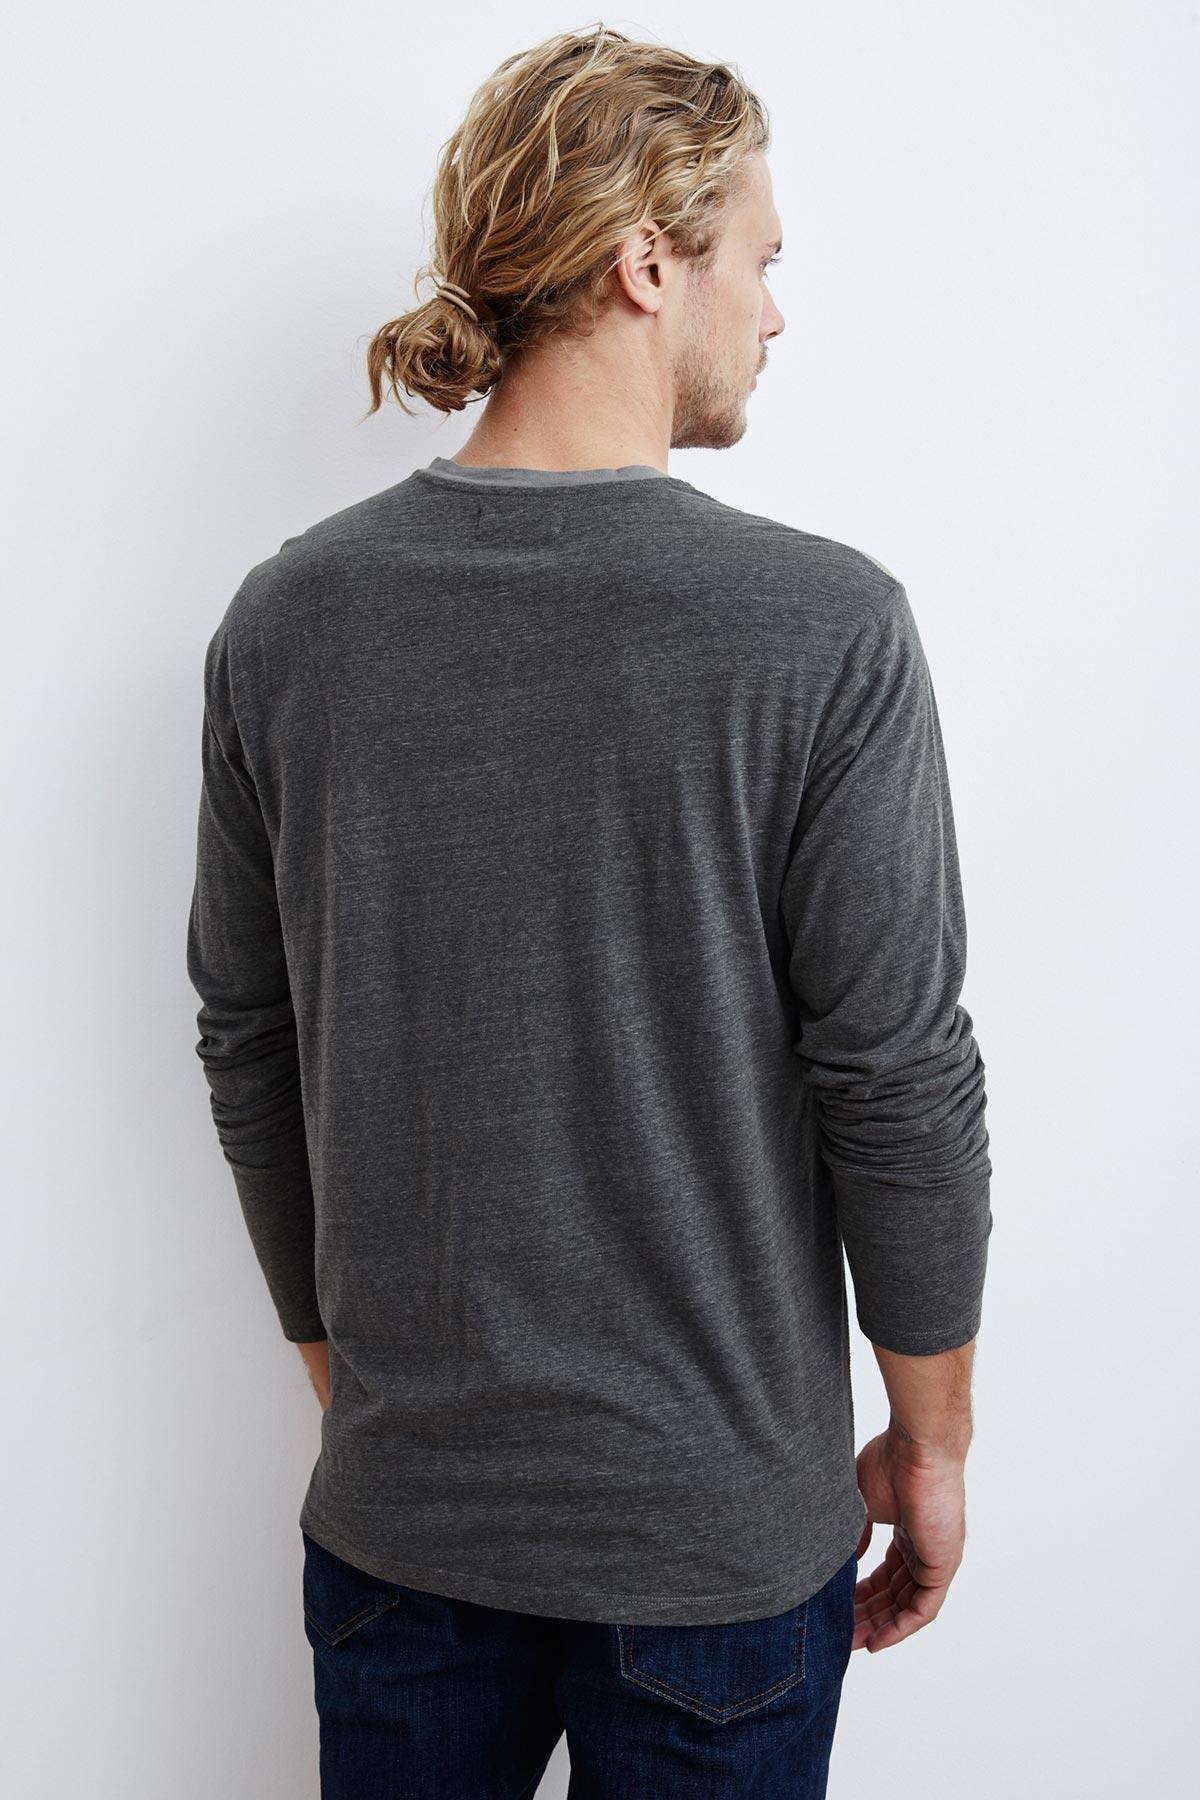 Mnshirt Mercedes W201 Mens Print T-Shirt Short Sleeve Blouse Tank Tops